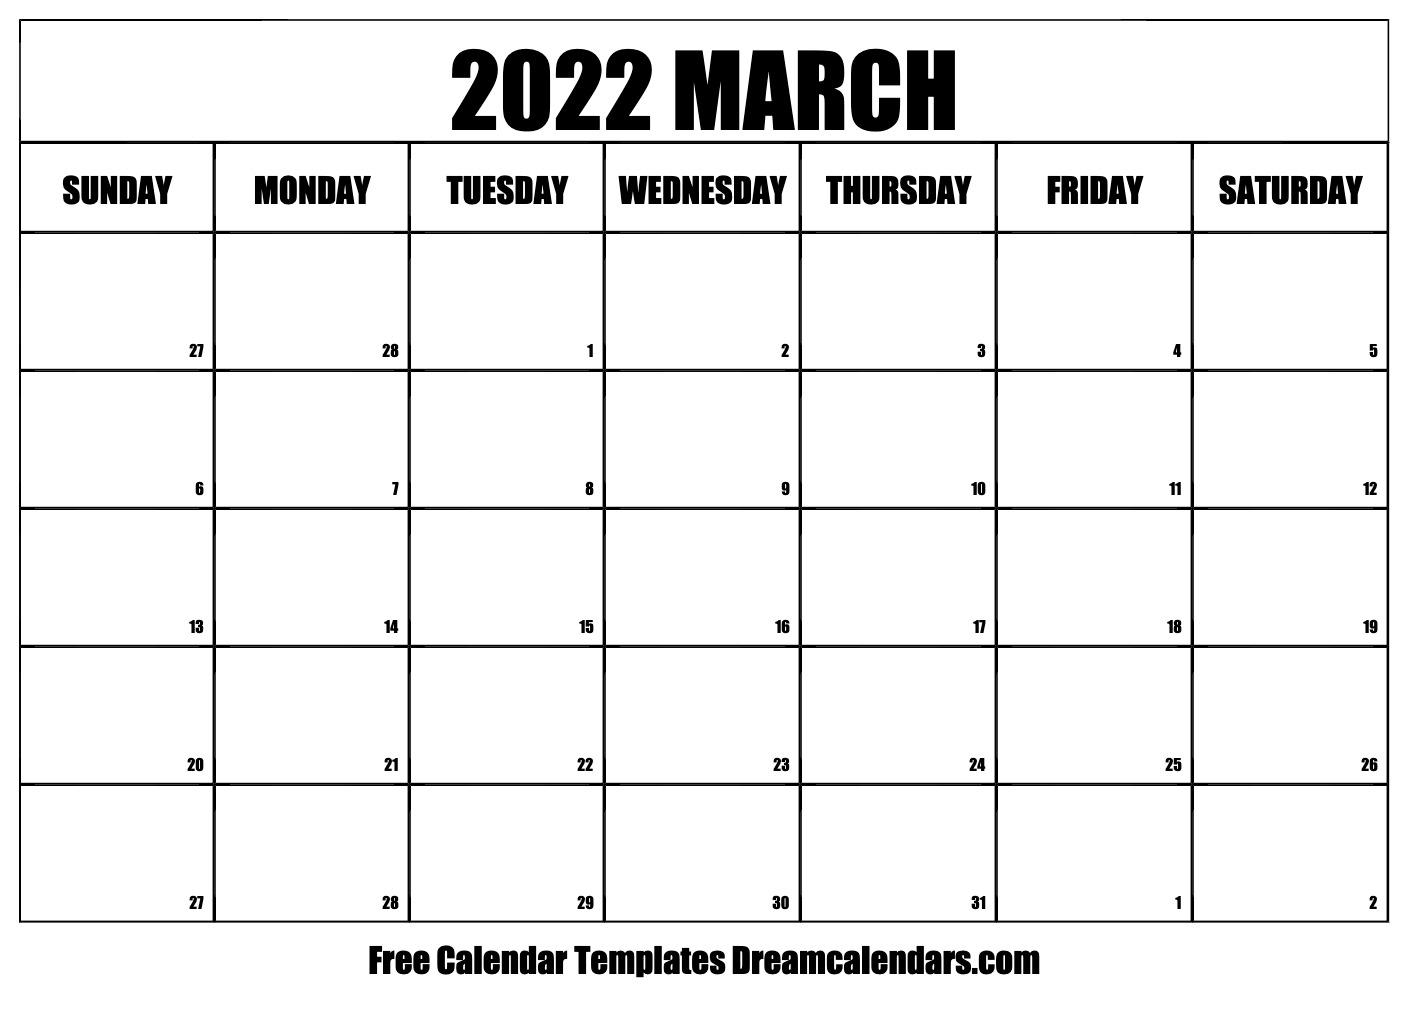 March 2022 Calendar | Free Blank Printable Templates With Regard To March 2022 Calendar Free Printable